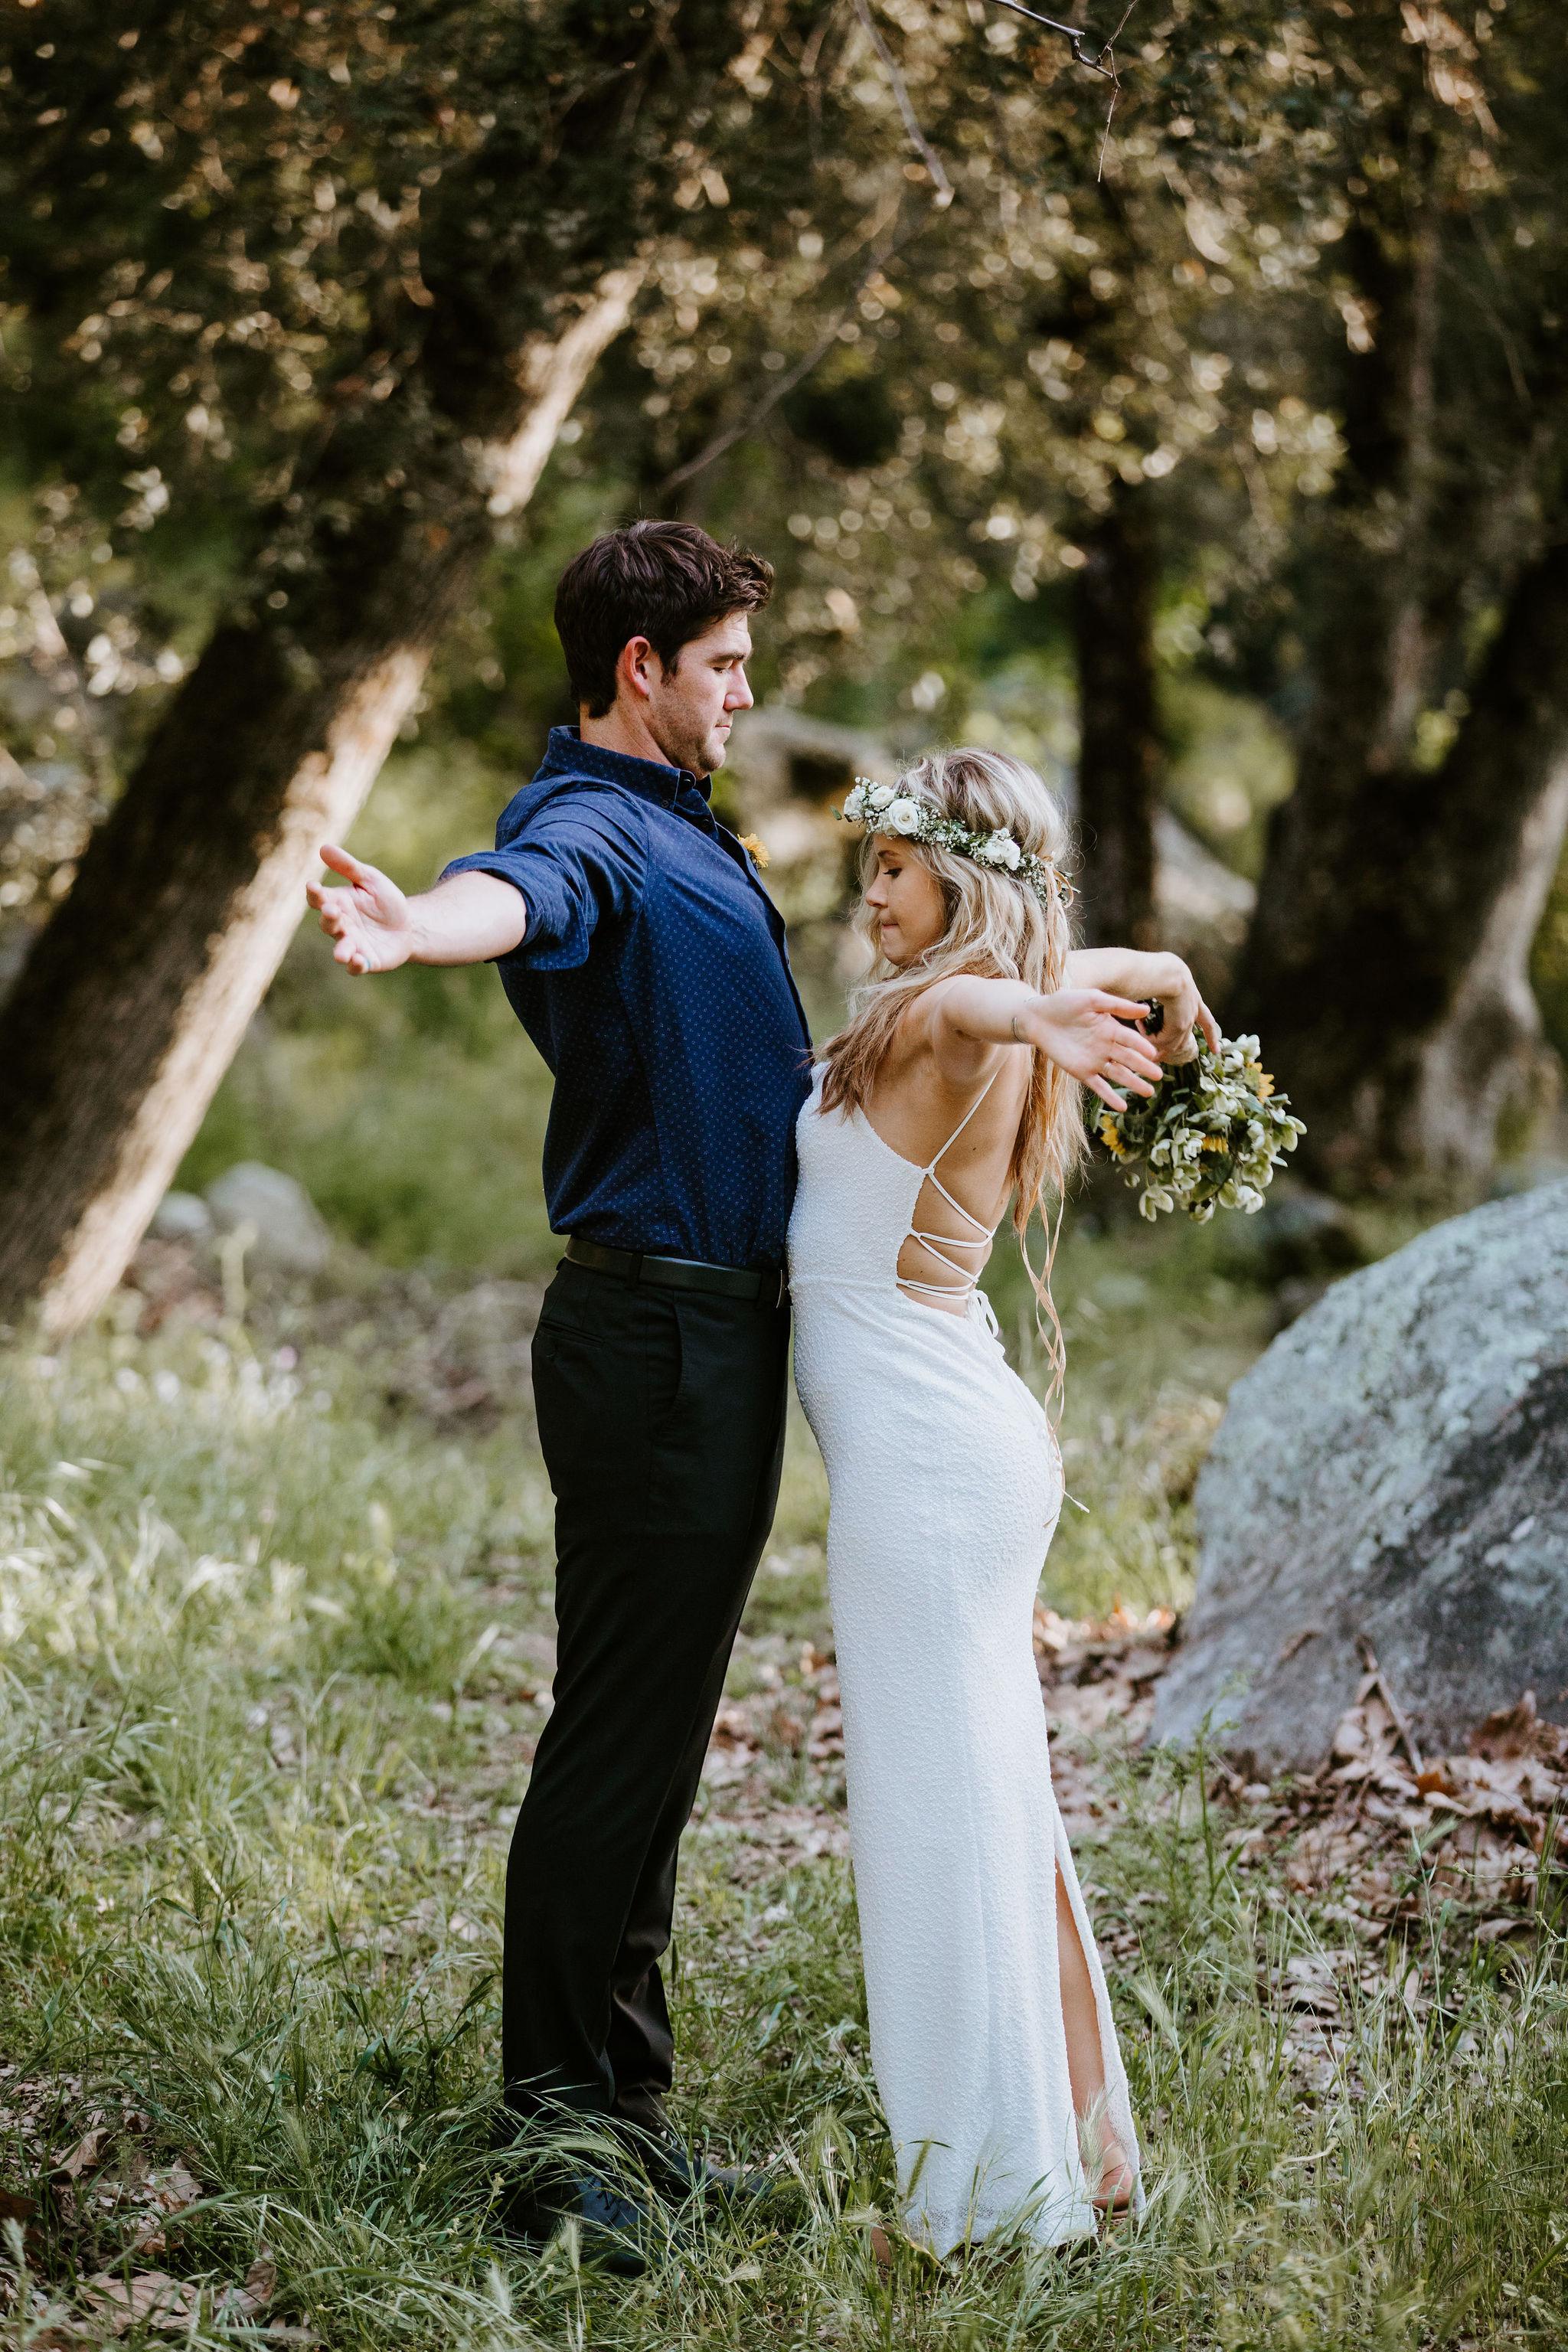 RedwoodRanch_Geoff&LyndsiPhotography_Mike&Amanda_Romantics23.jpg